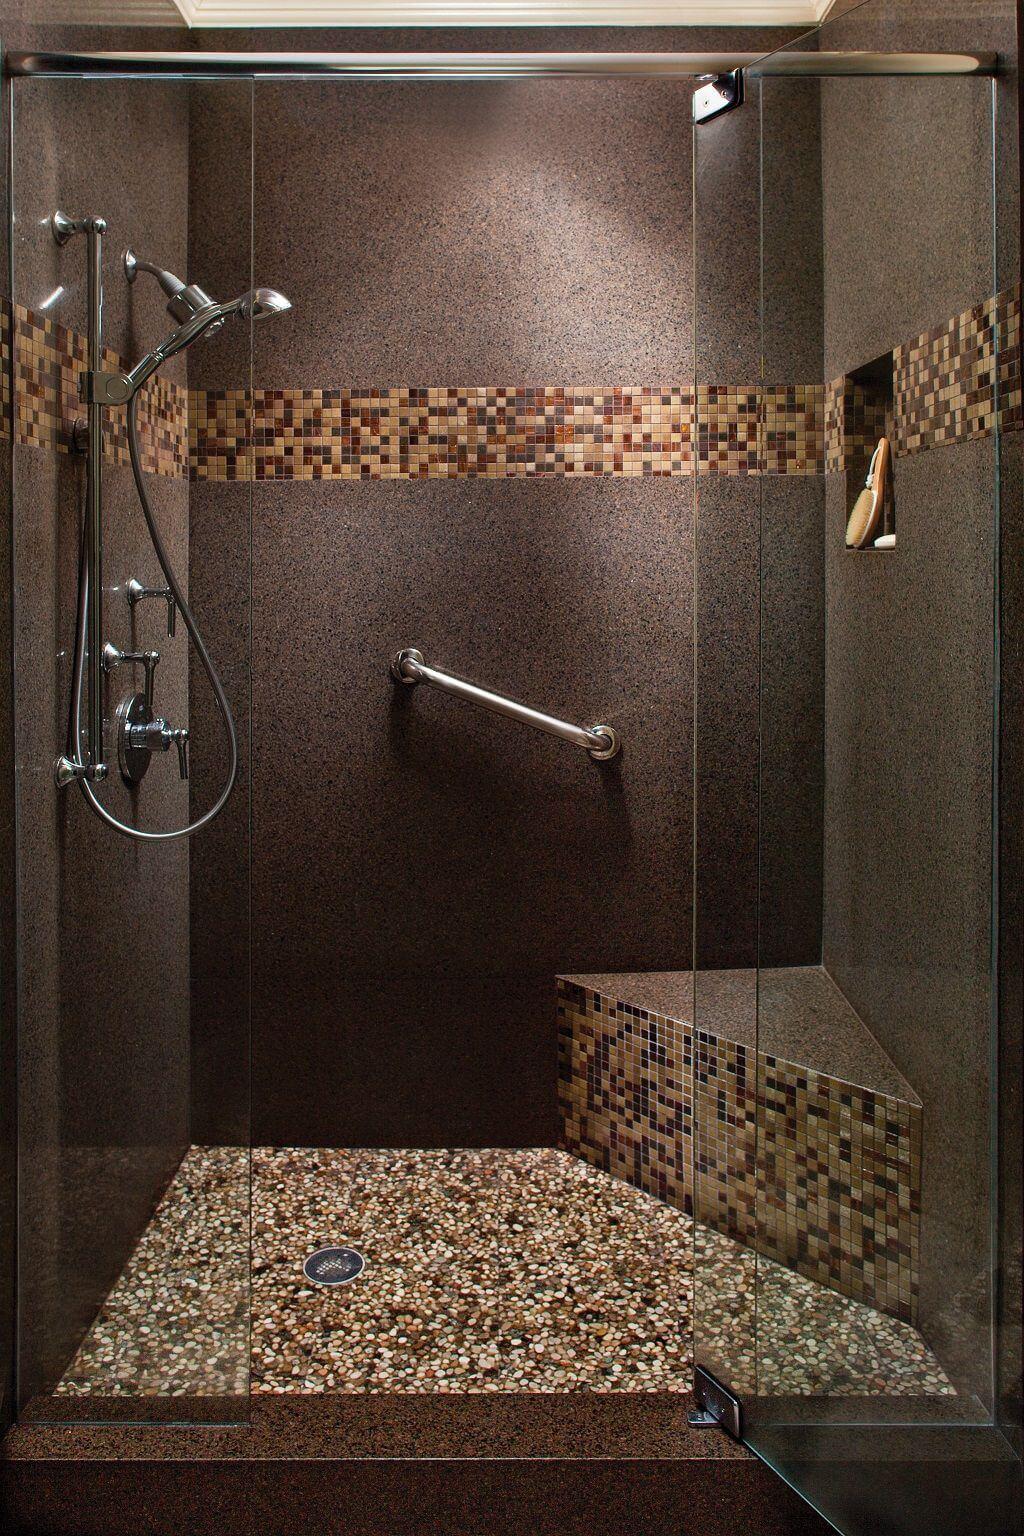 32 Best Shower Tile Ideas That Will Transform Your Bathroom Rina Watt Blogger Home Decor Diy And Recipes